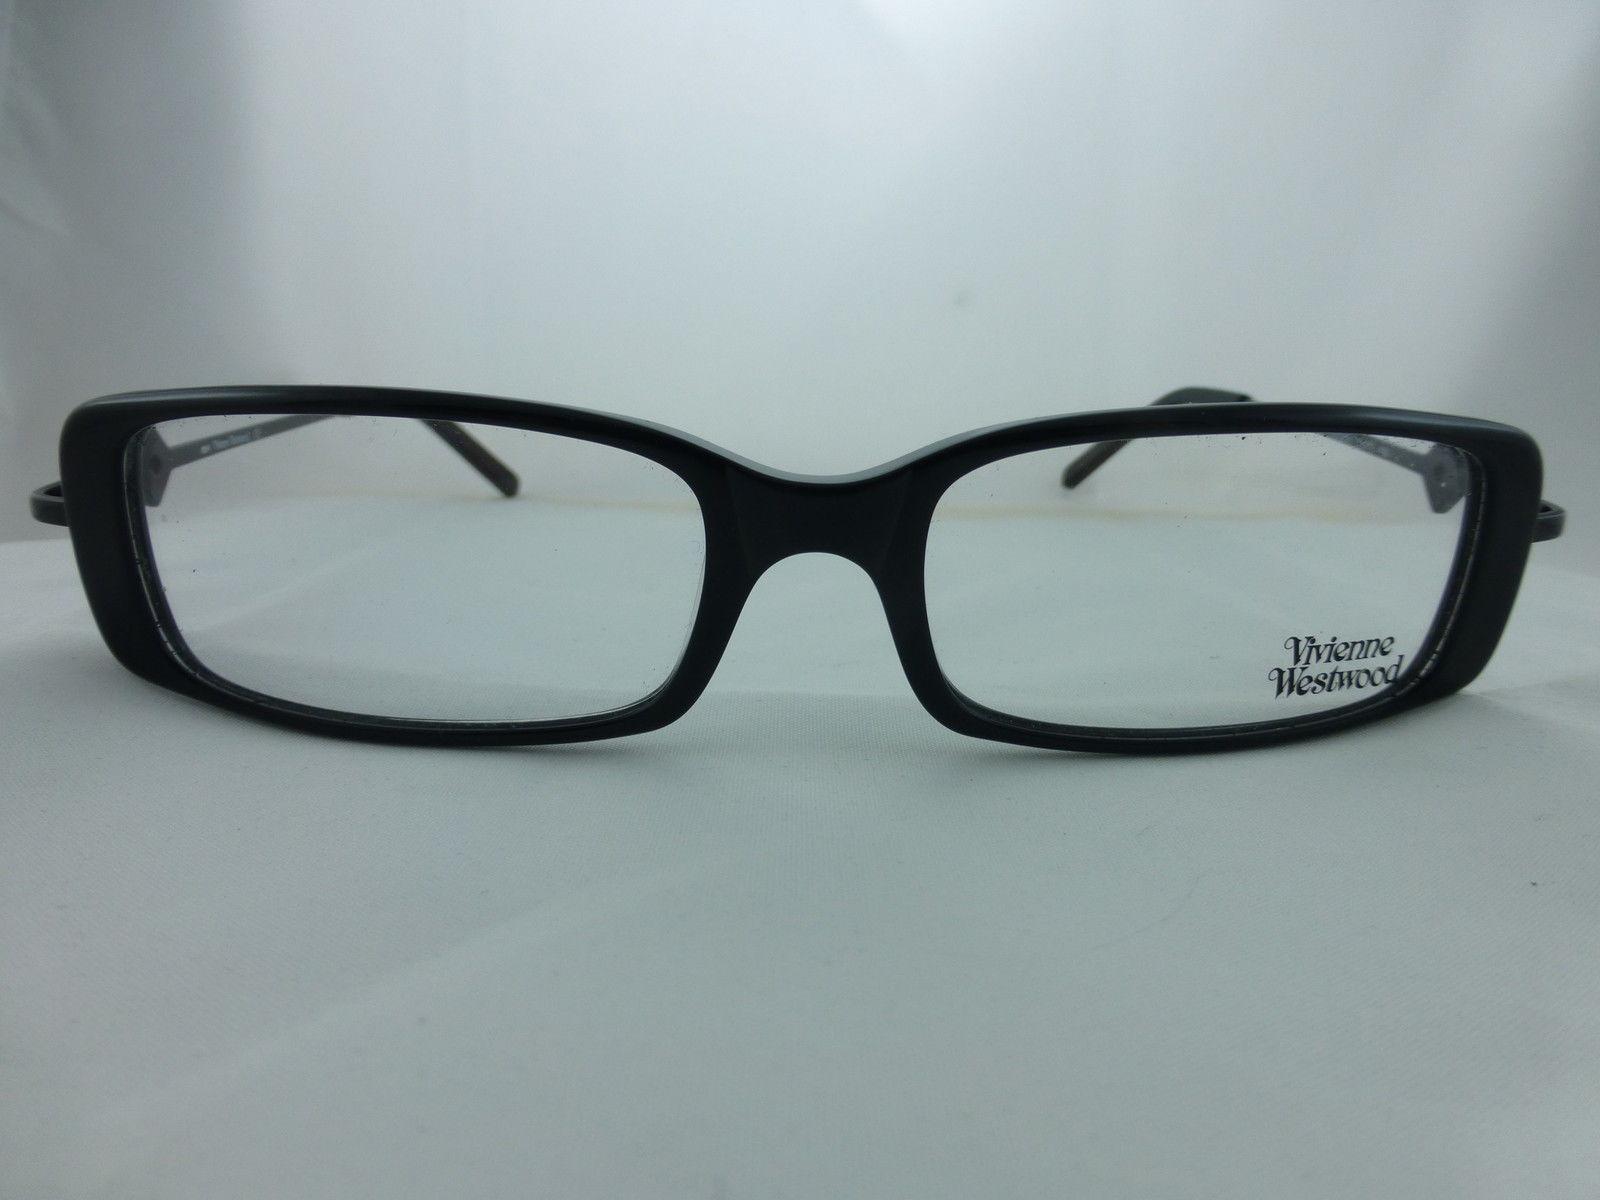 vivienne westwood great eyeglasses frame fashion